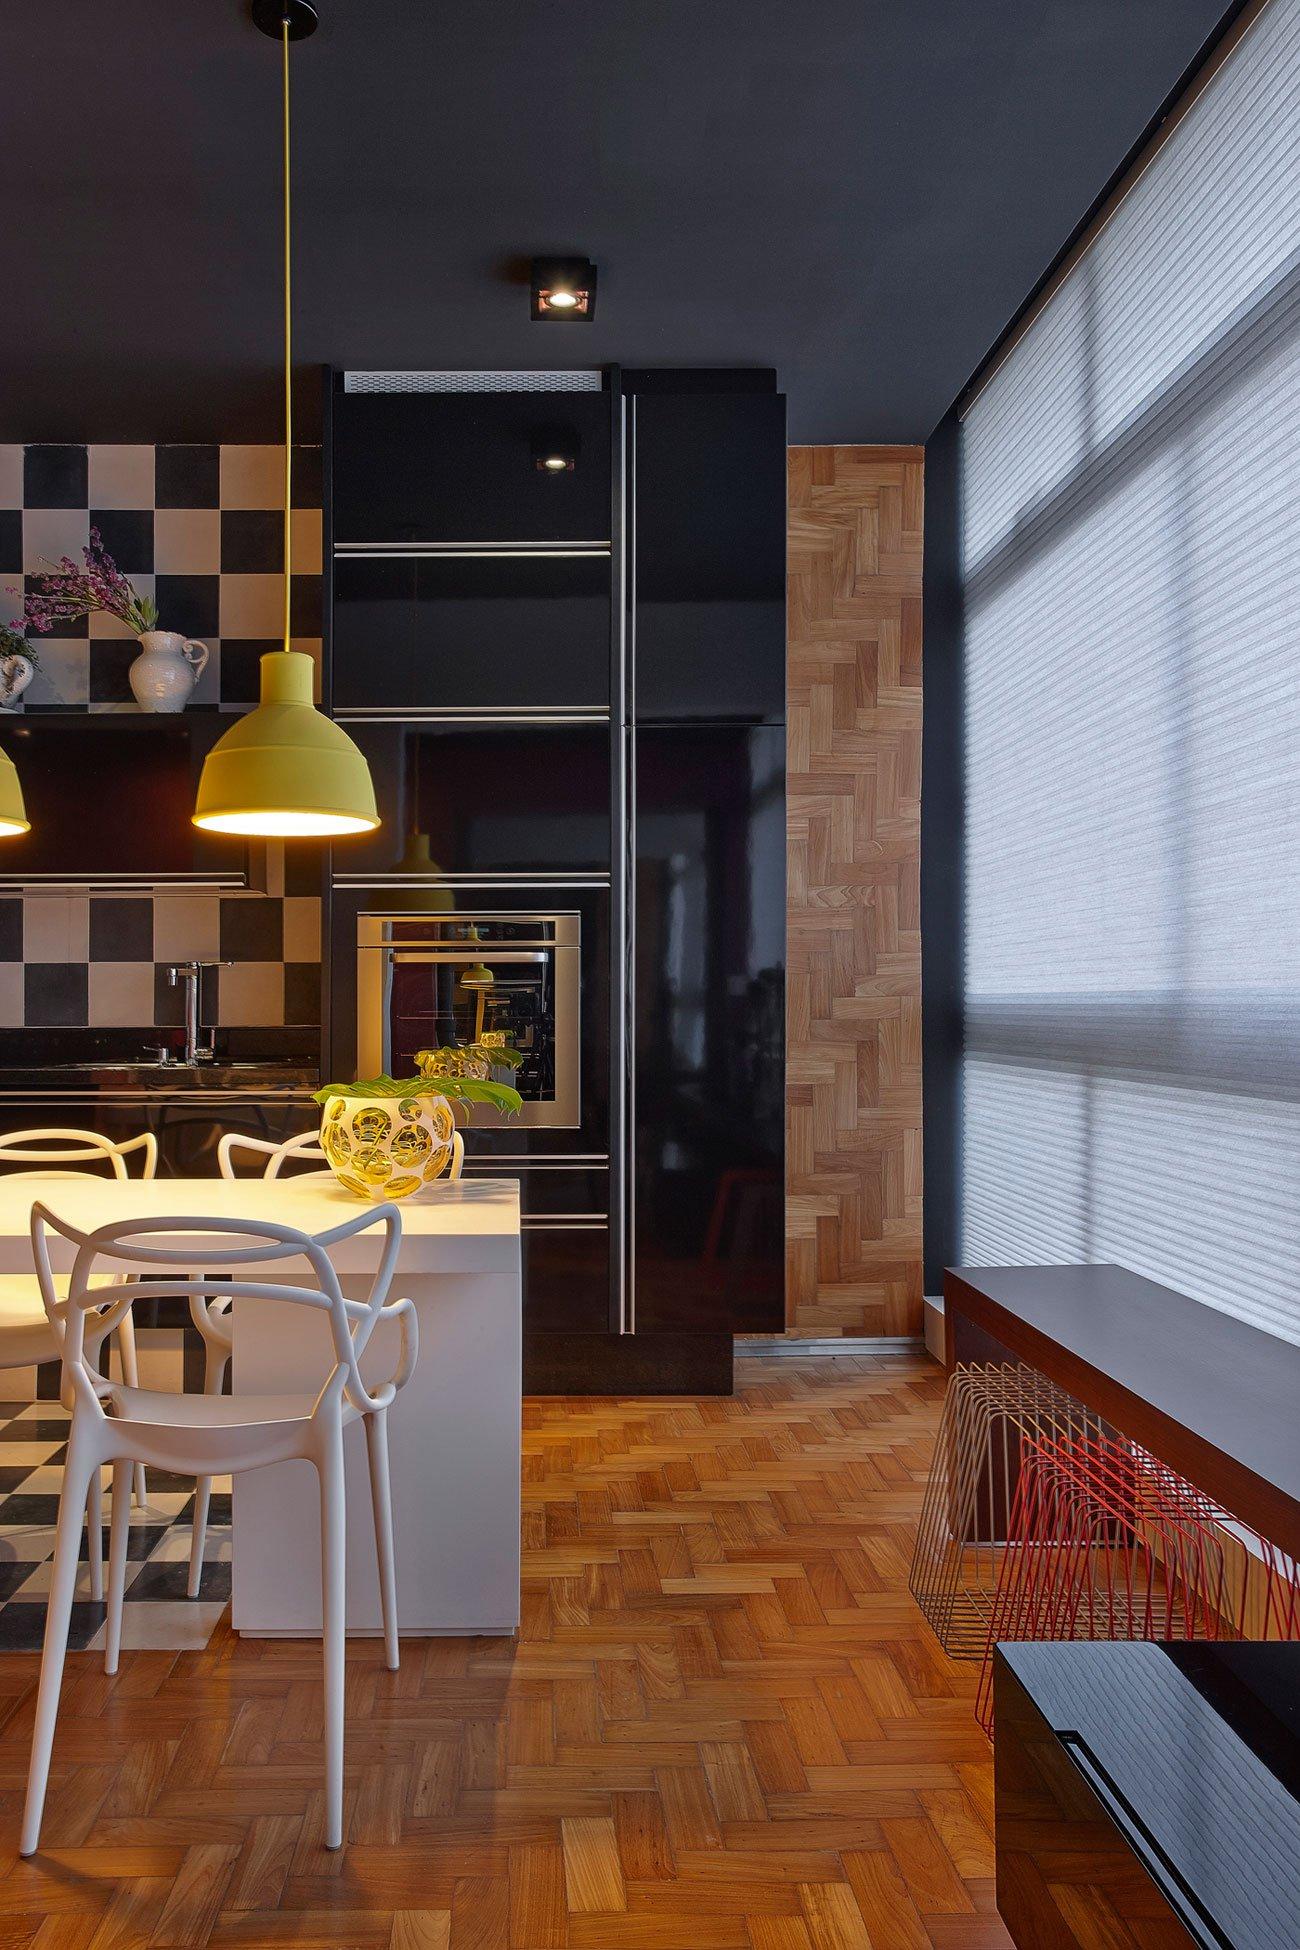 Apartment-in-Belo-Horizonte-16